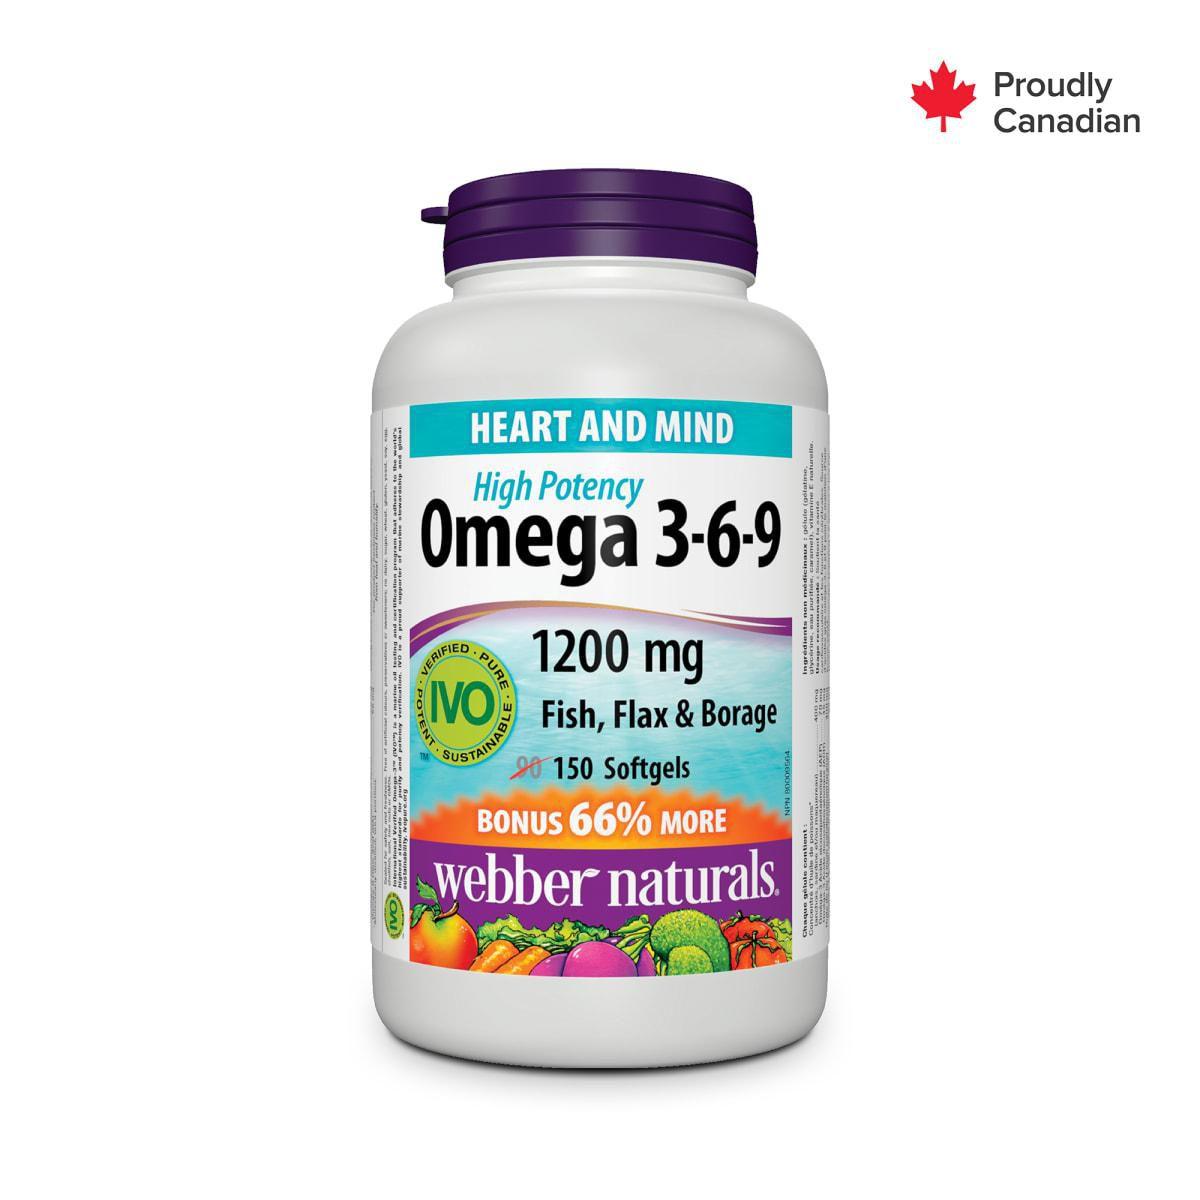 Webber Naturals Omega 3 6 9 High Potency Fish Flax Borage